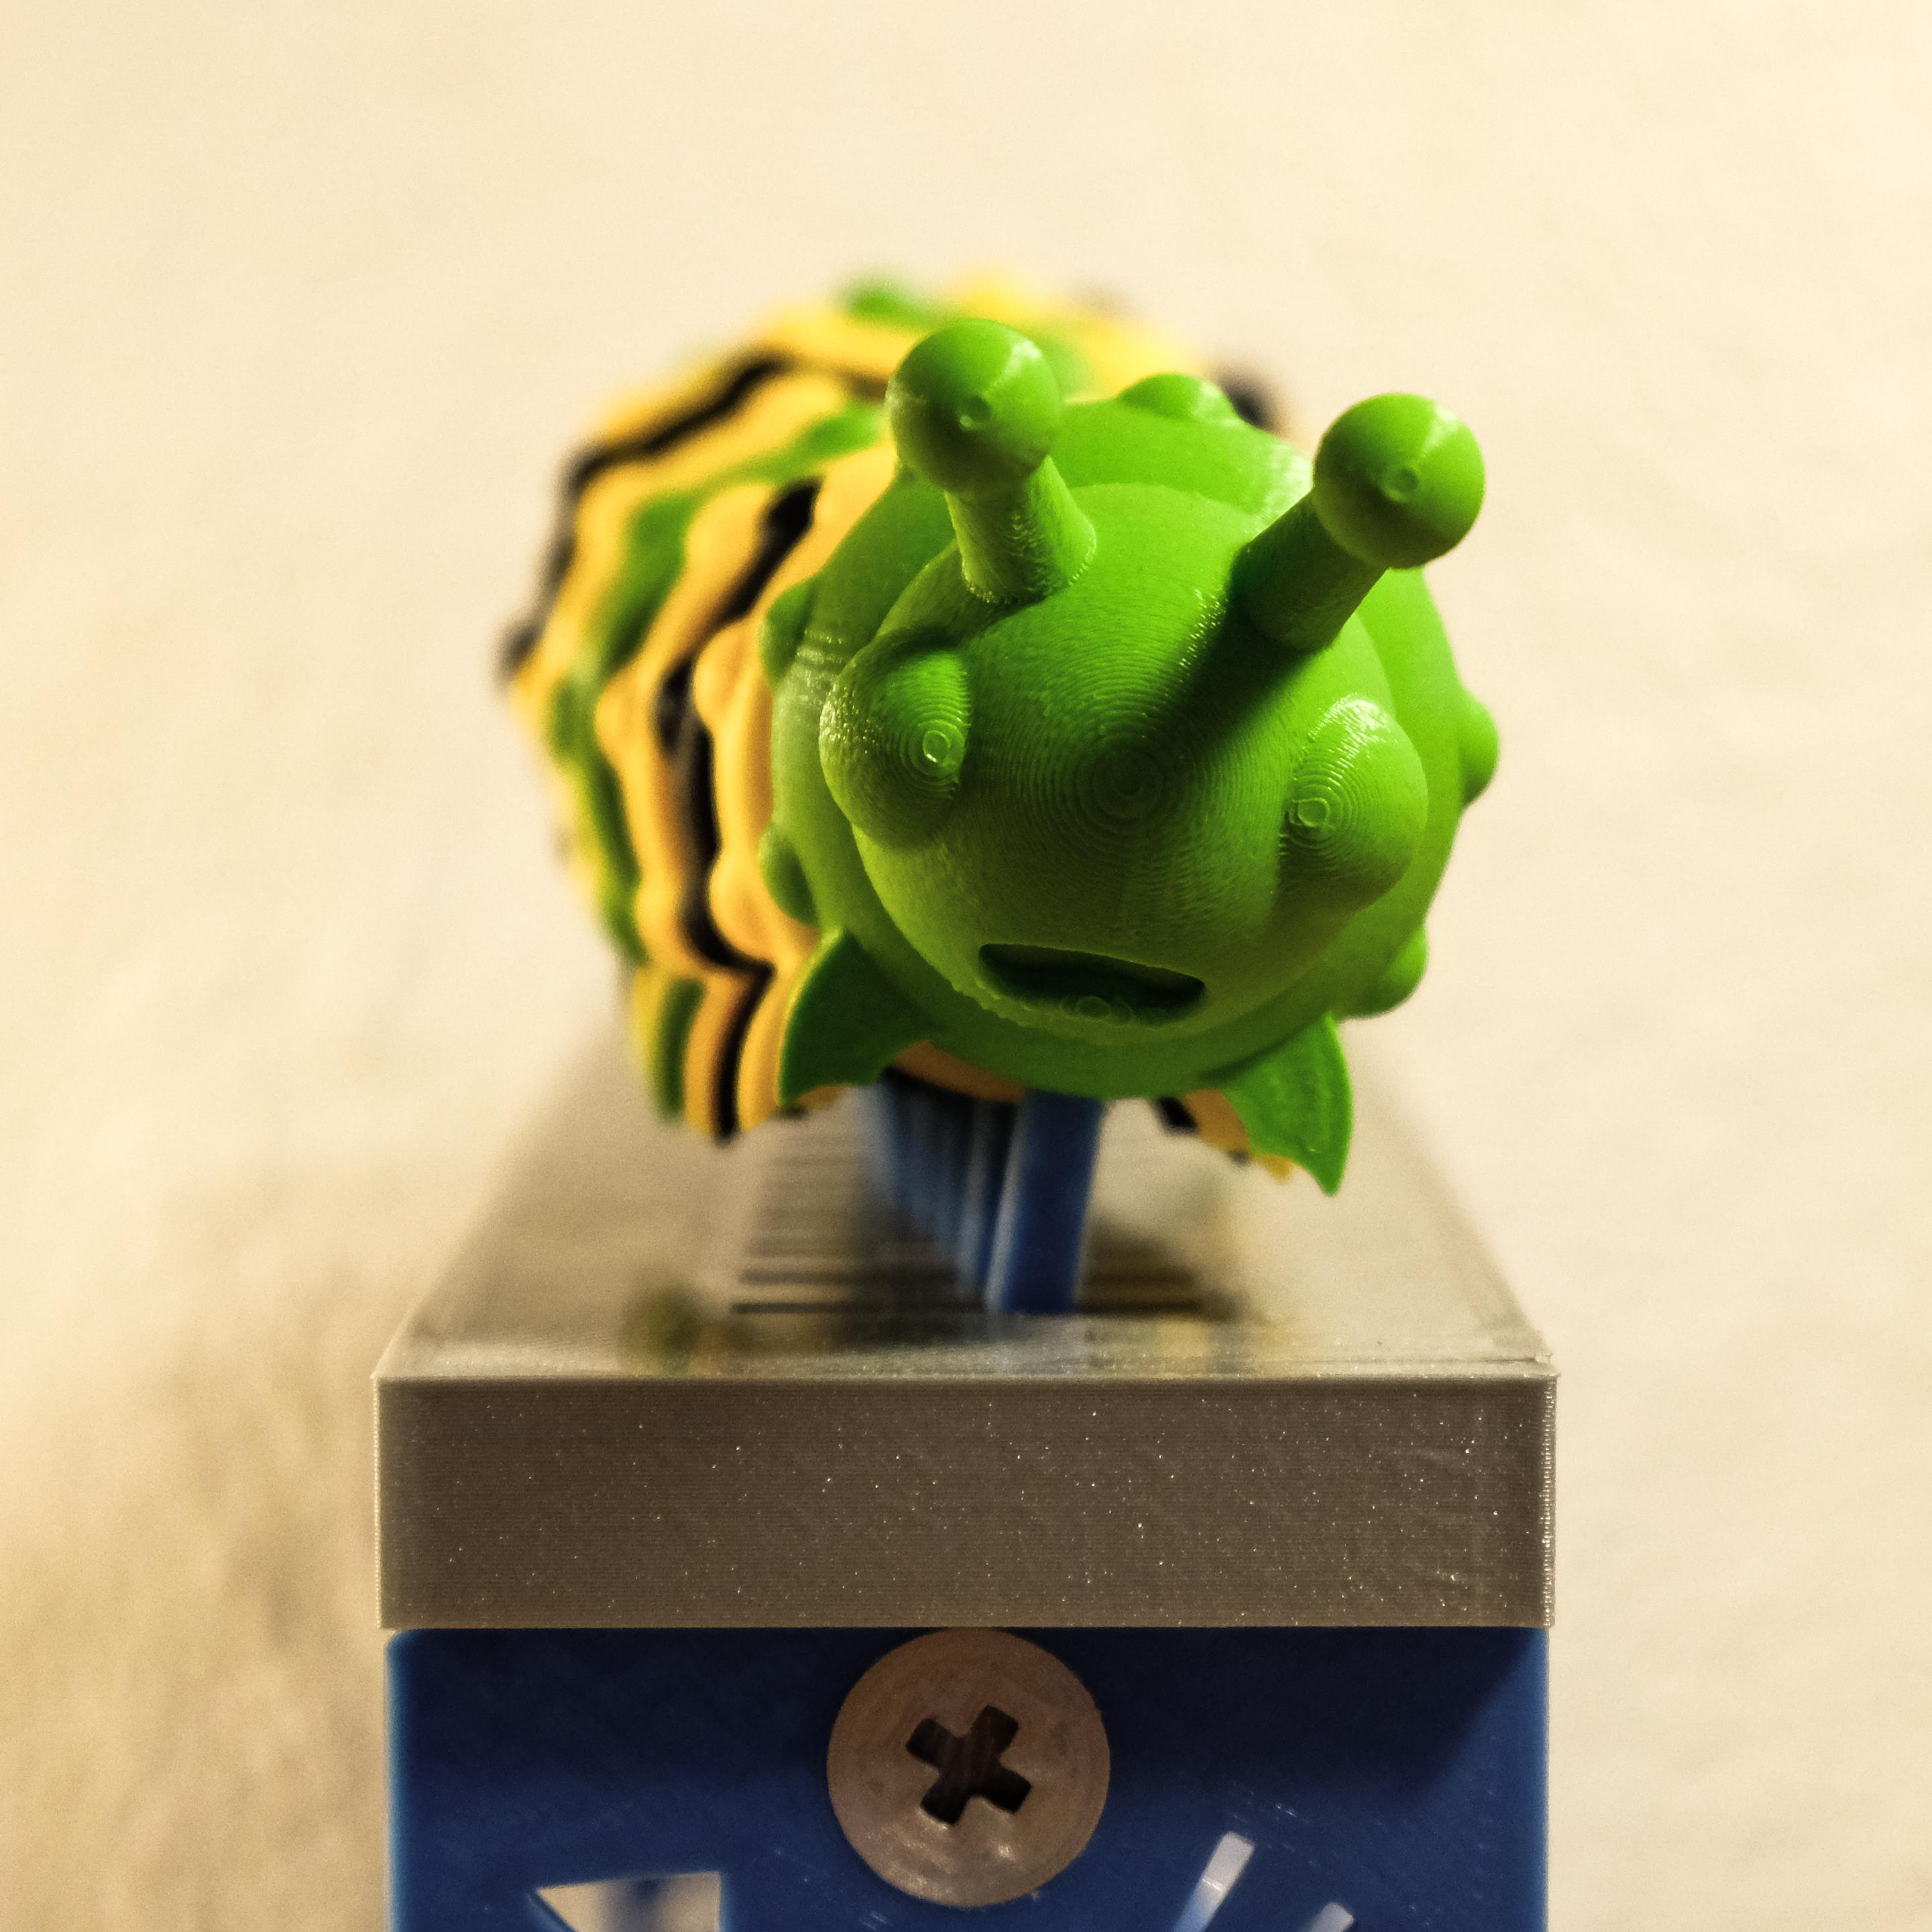 2-10.jpg Download STL file Shape Shaker_Caterpillar • Design to 3D print, Ocrobus